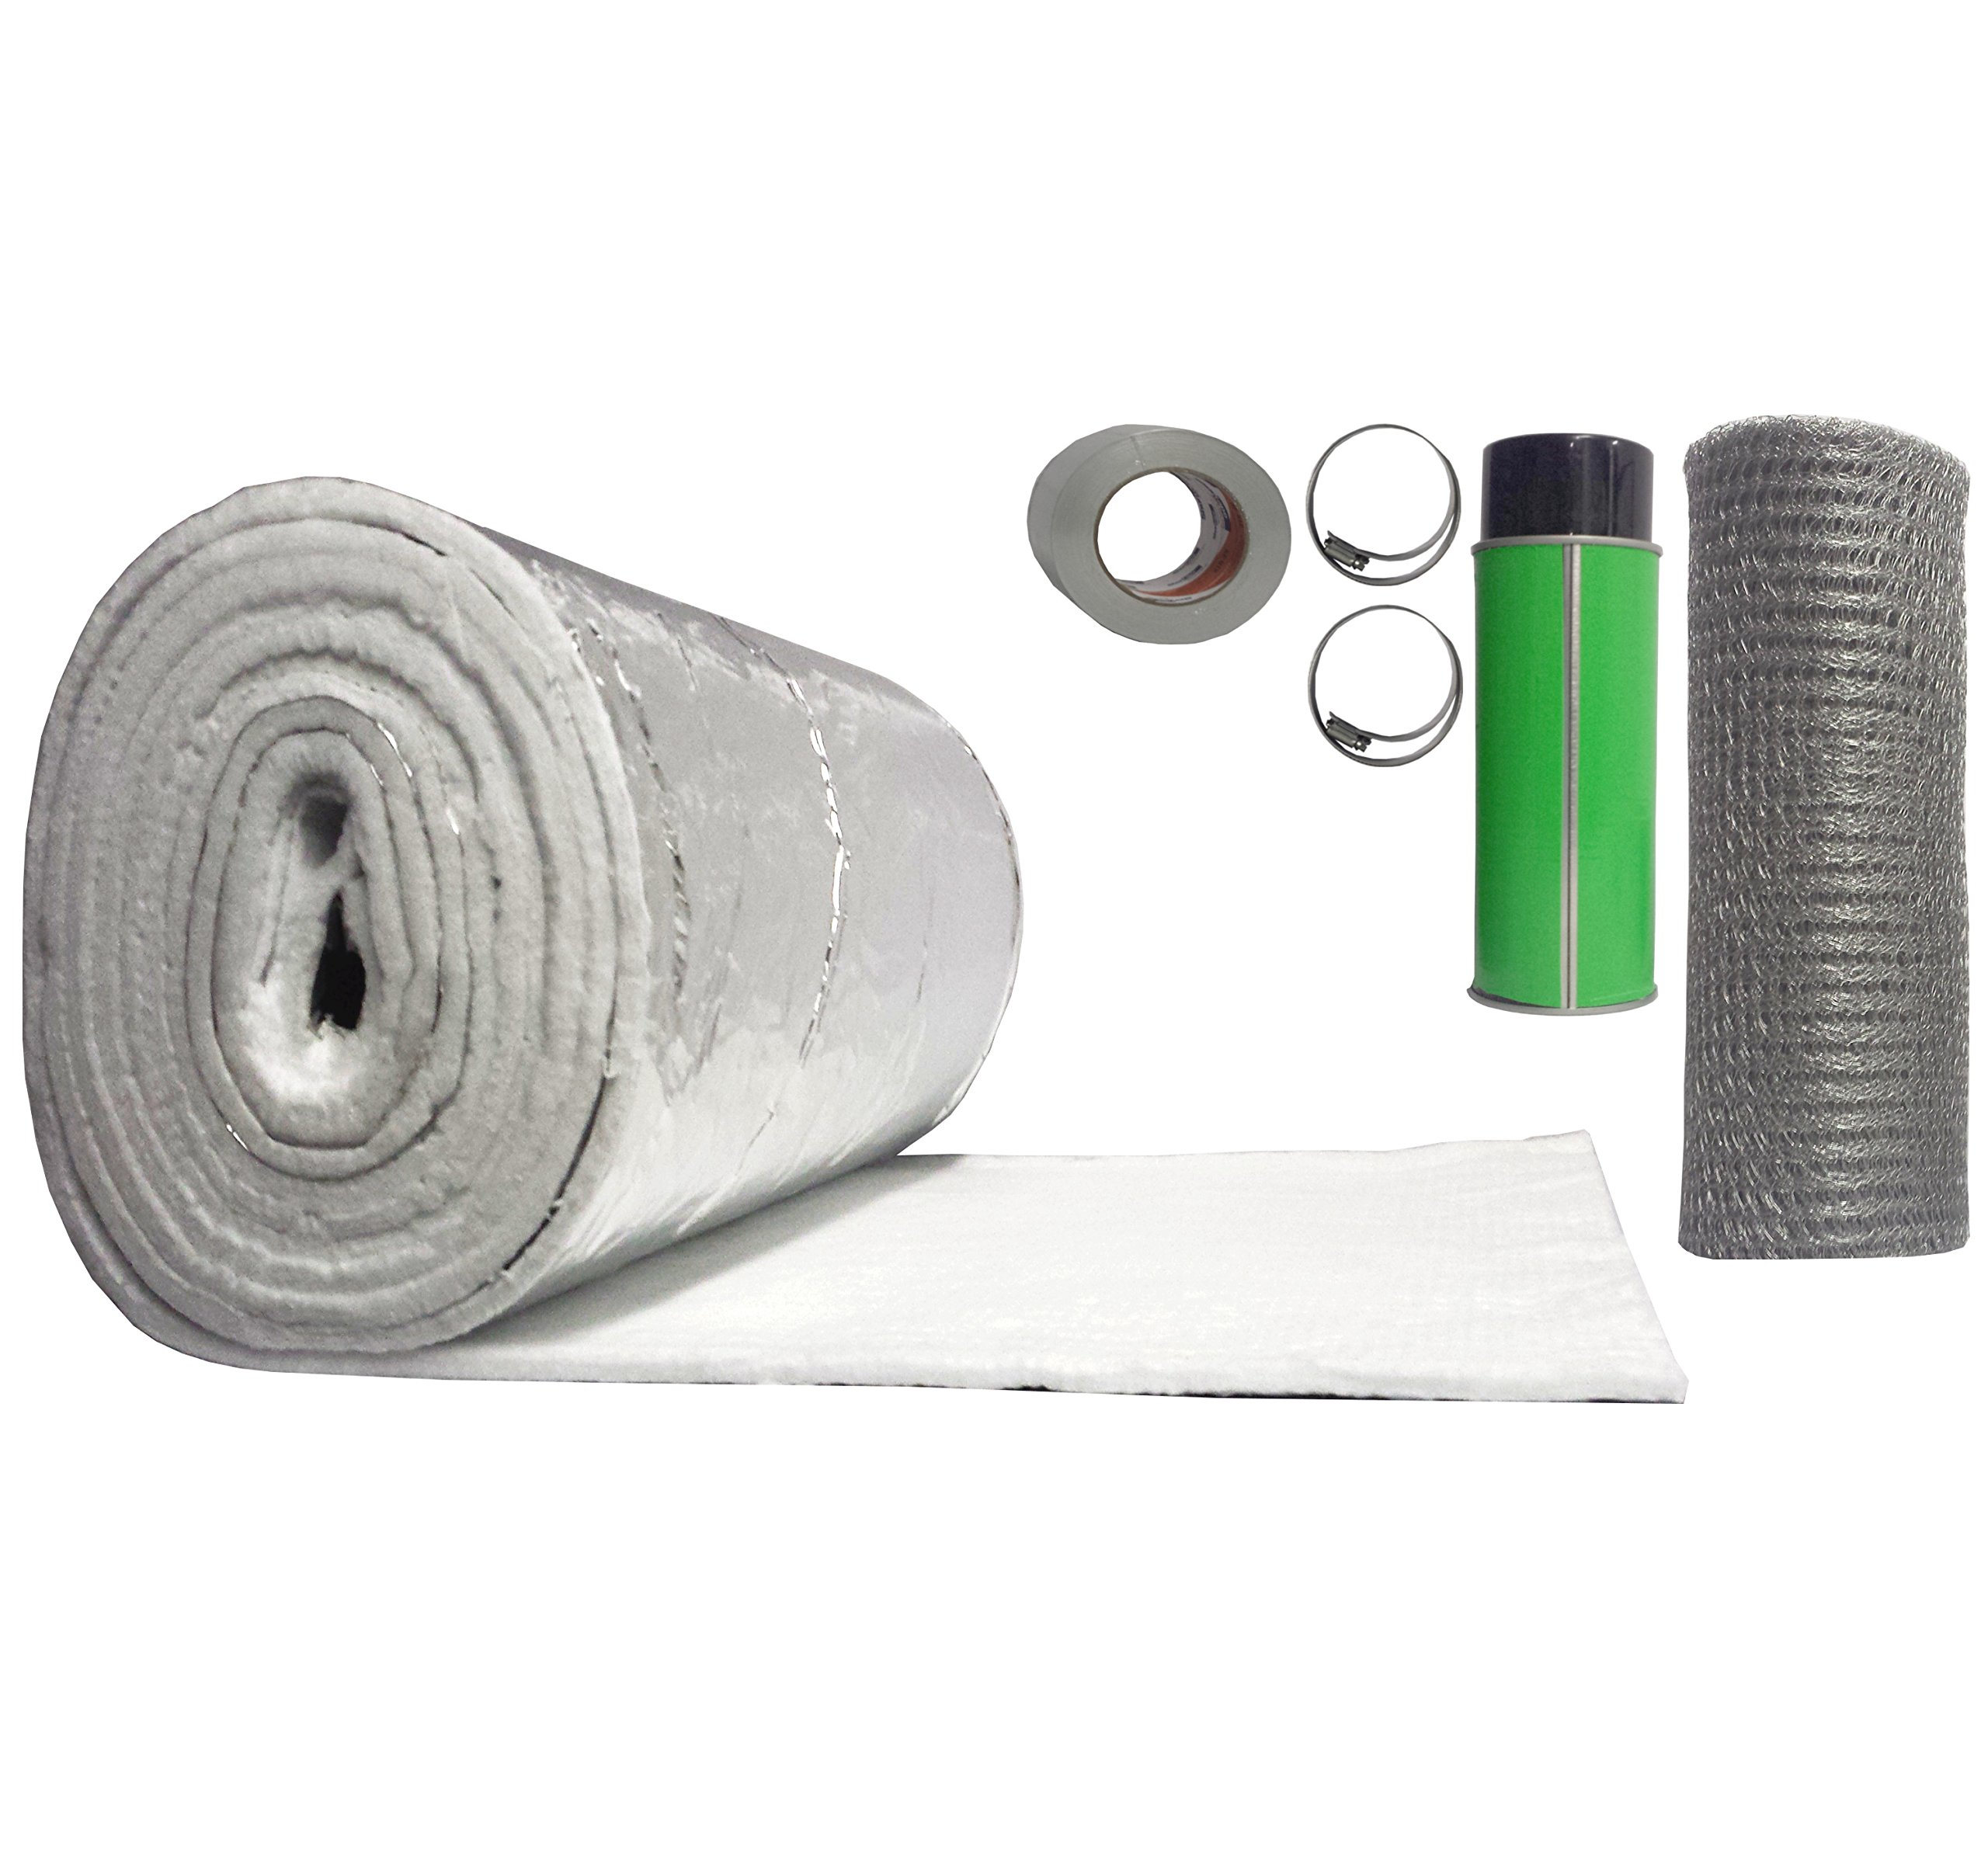 Rockford Chimney Supply Chimney Liner Insulation Blanket Kit, 3 to 6 Inch Diameter x 25 Feet by Rockford Chimney Supply